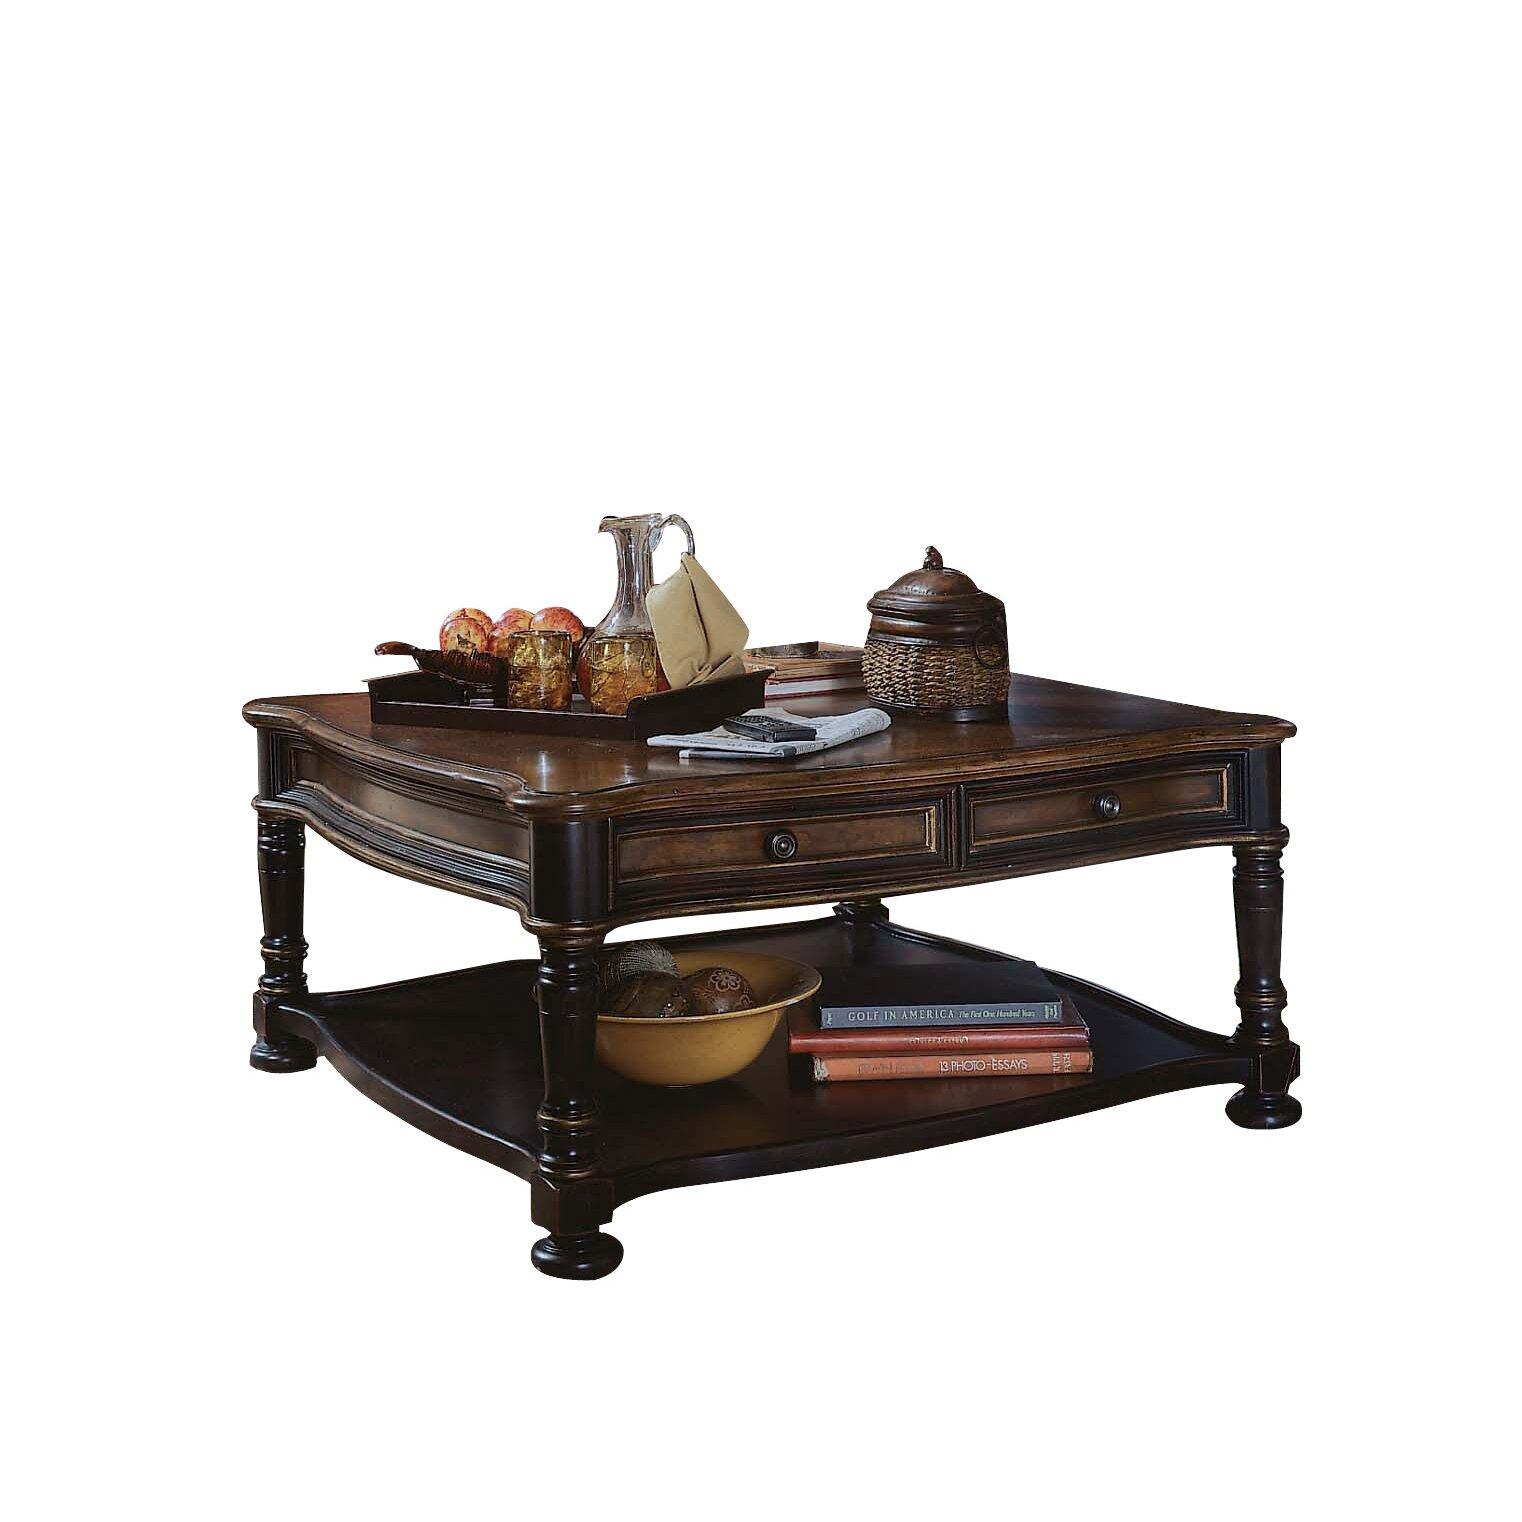 Https Www Wayfair Com Hooker Furniture Preston Ridge Coffee Table 864 80 112 Hkr3506 Html